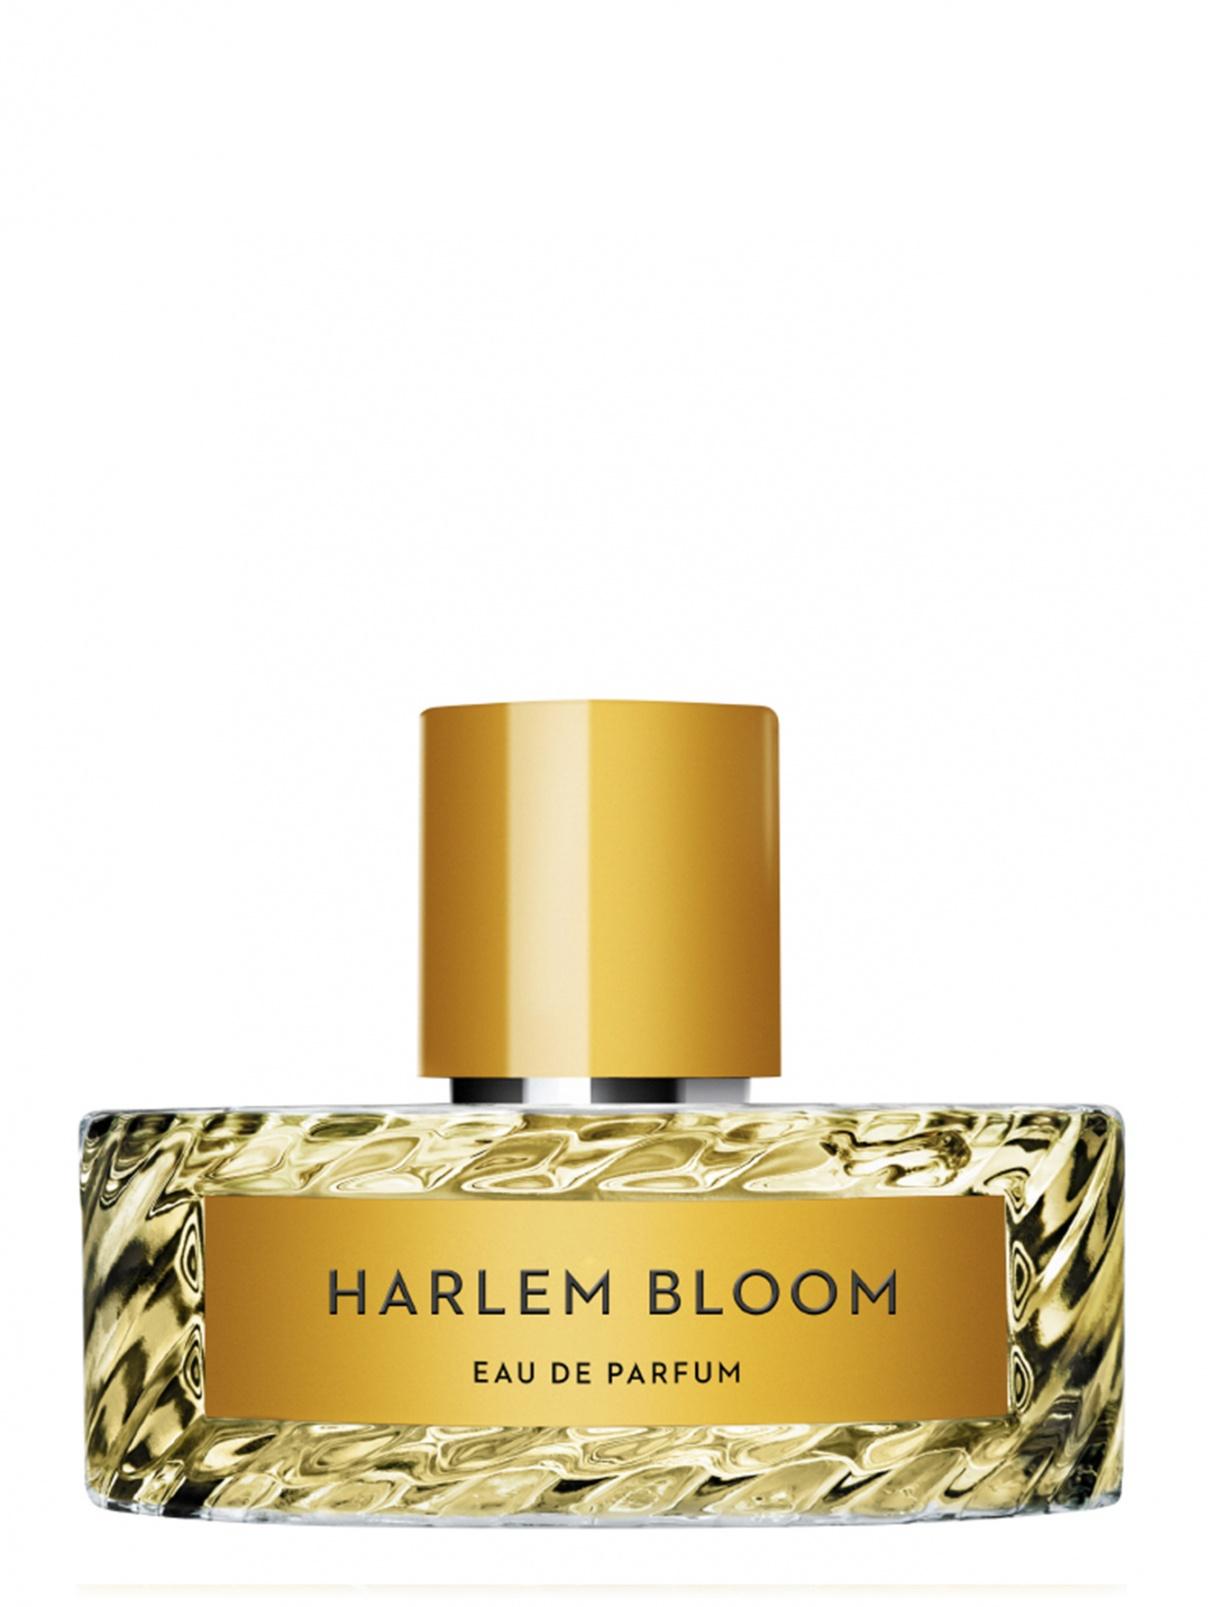 Парфюмерная вода 100 мл Harlem Bloom Vilhelm Parfumerie  –  Общий вид